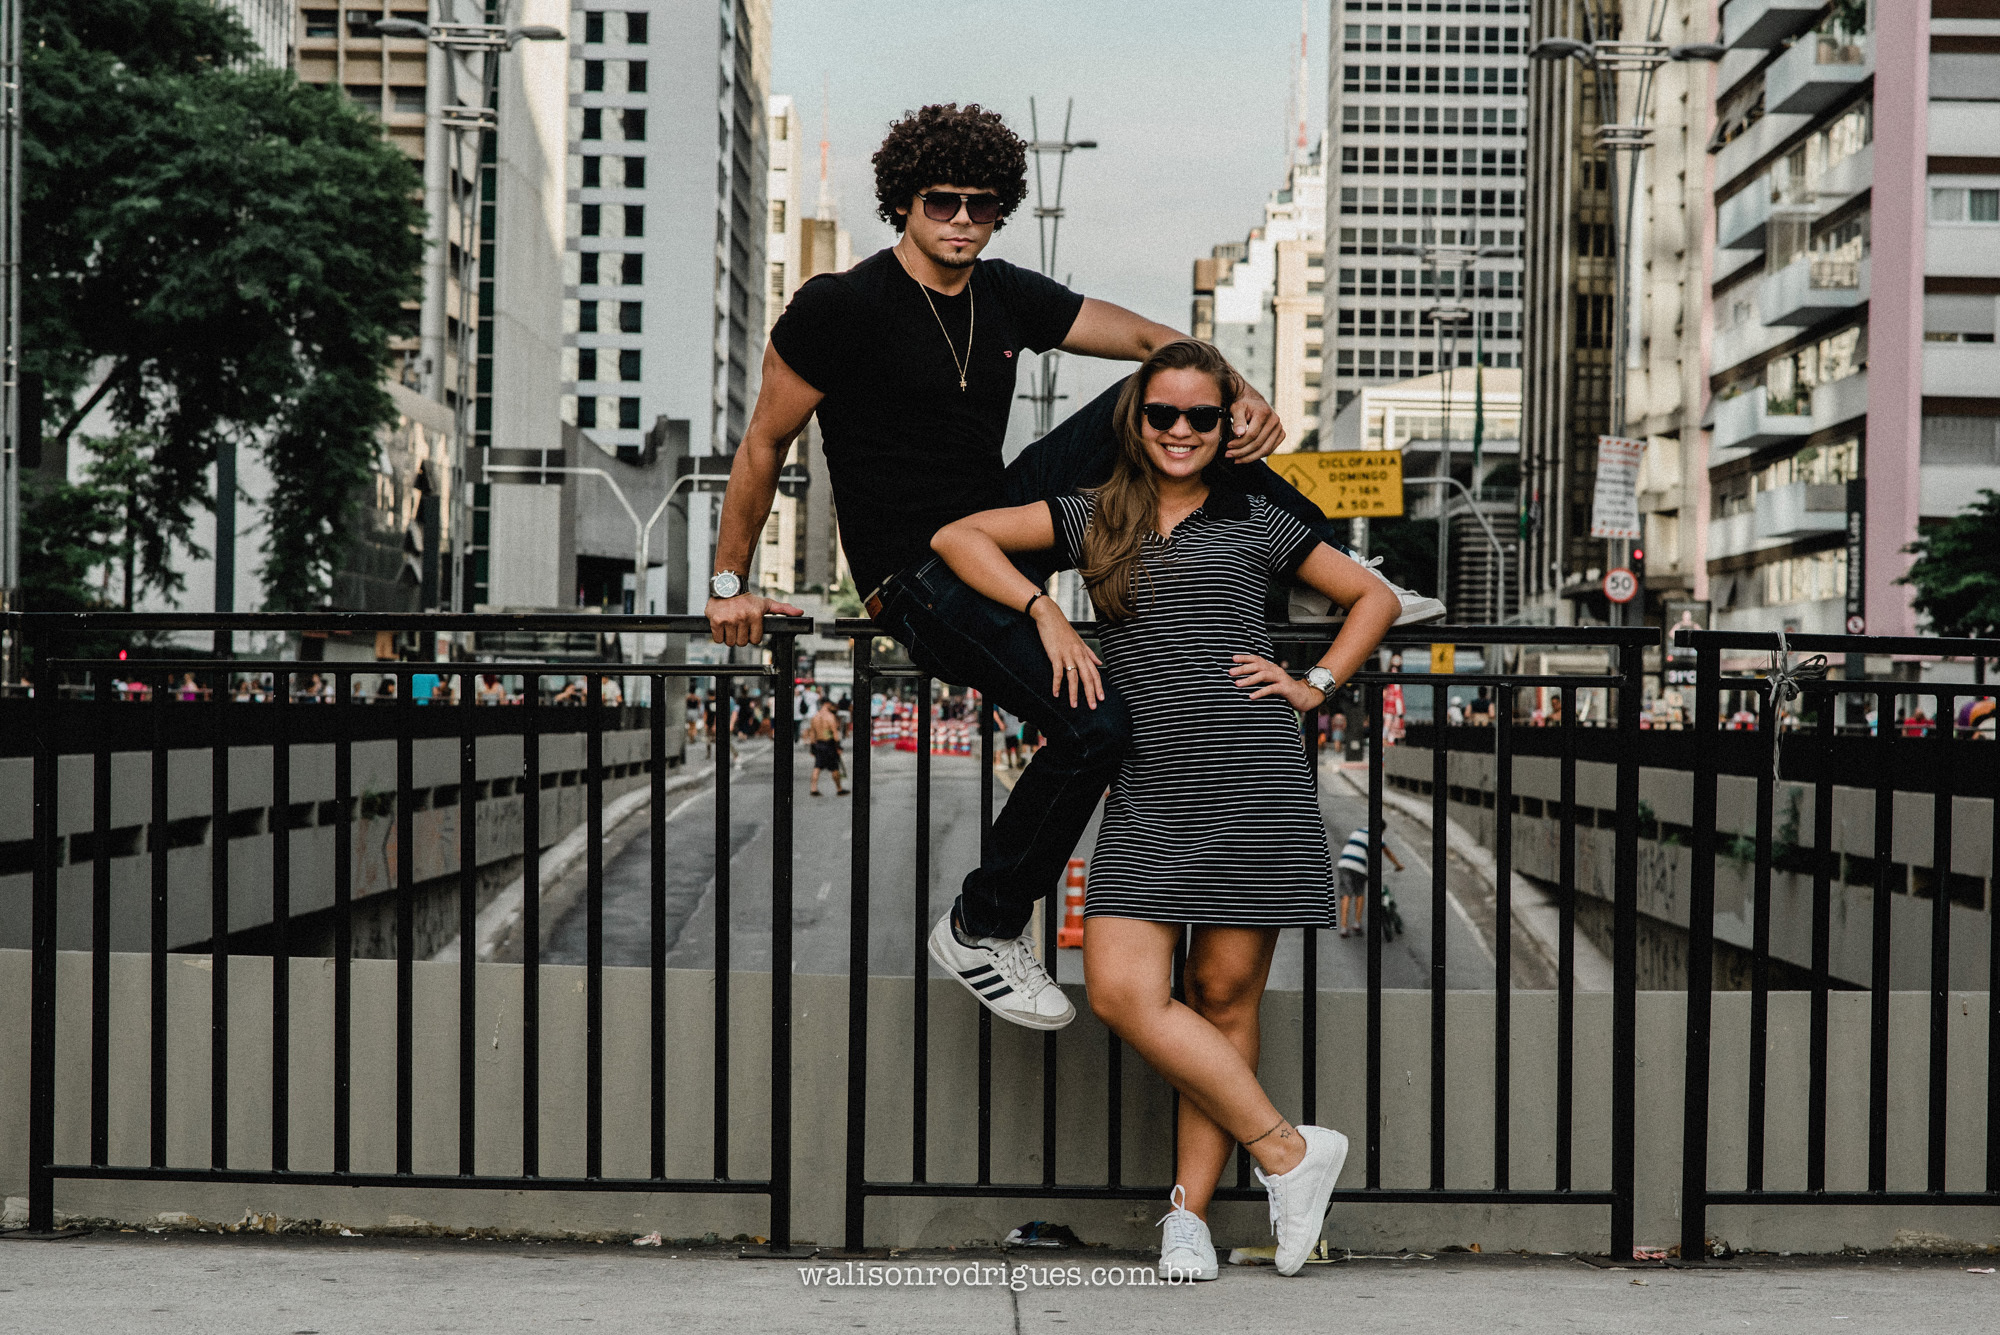 Contate Walison Rodrigues - fotógrafo de Casamento em  Fortaleza -CE